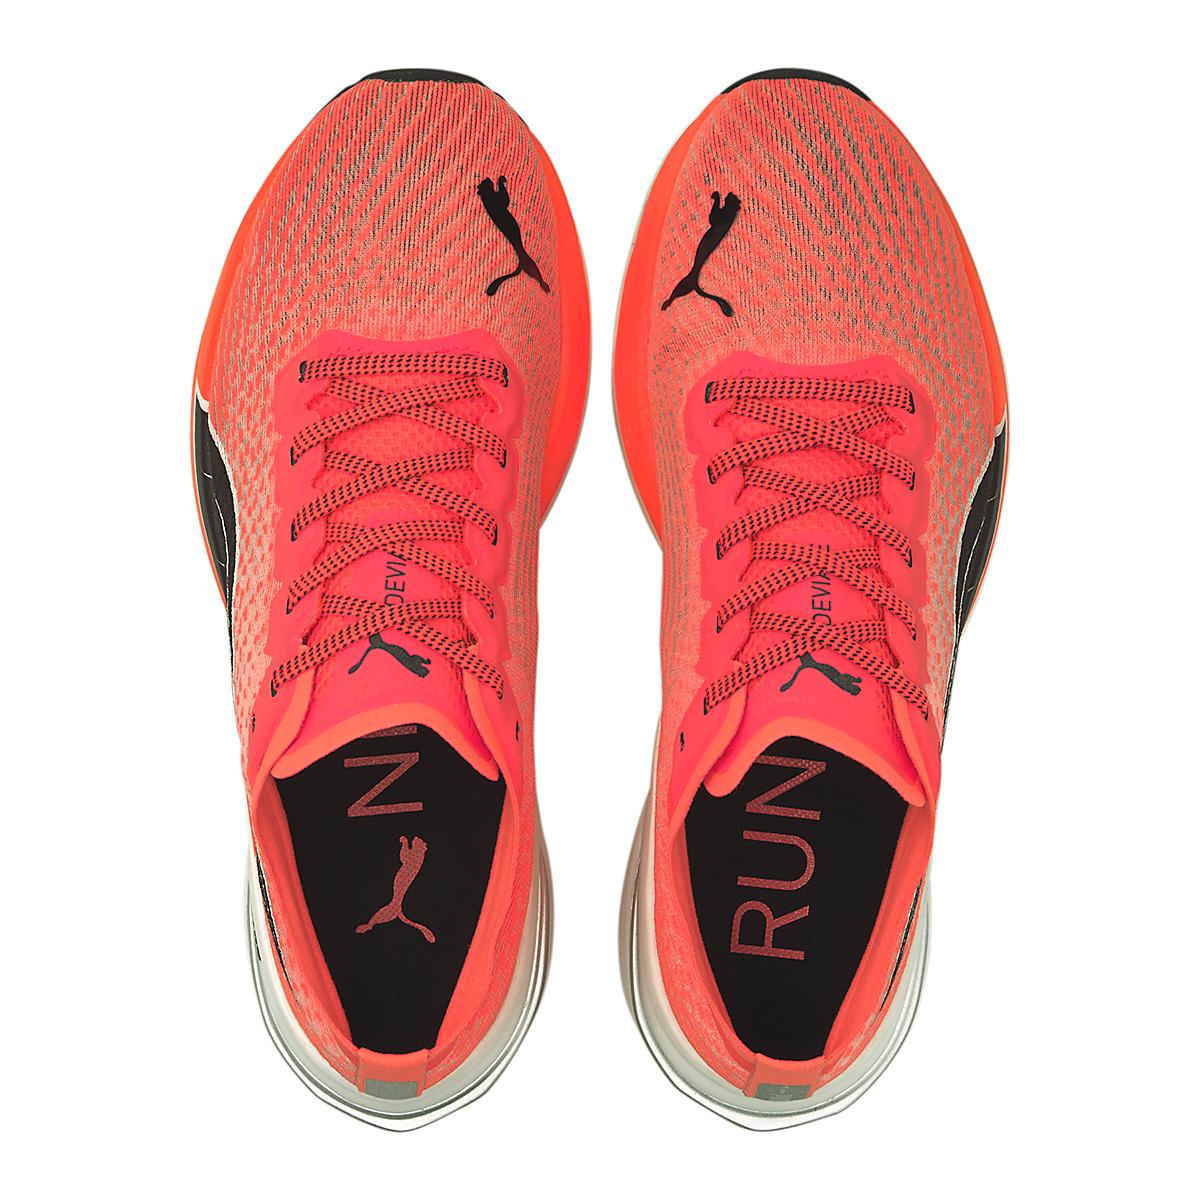 Women's Puma Deviate Nitro Running Shoe - Color: Lava Blast-Puma Black - Size: 5.5 - Width: Regular, Lava Blast-Puma Black, large, image 4